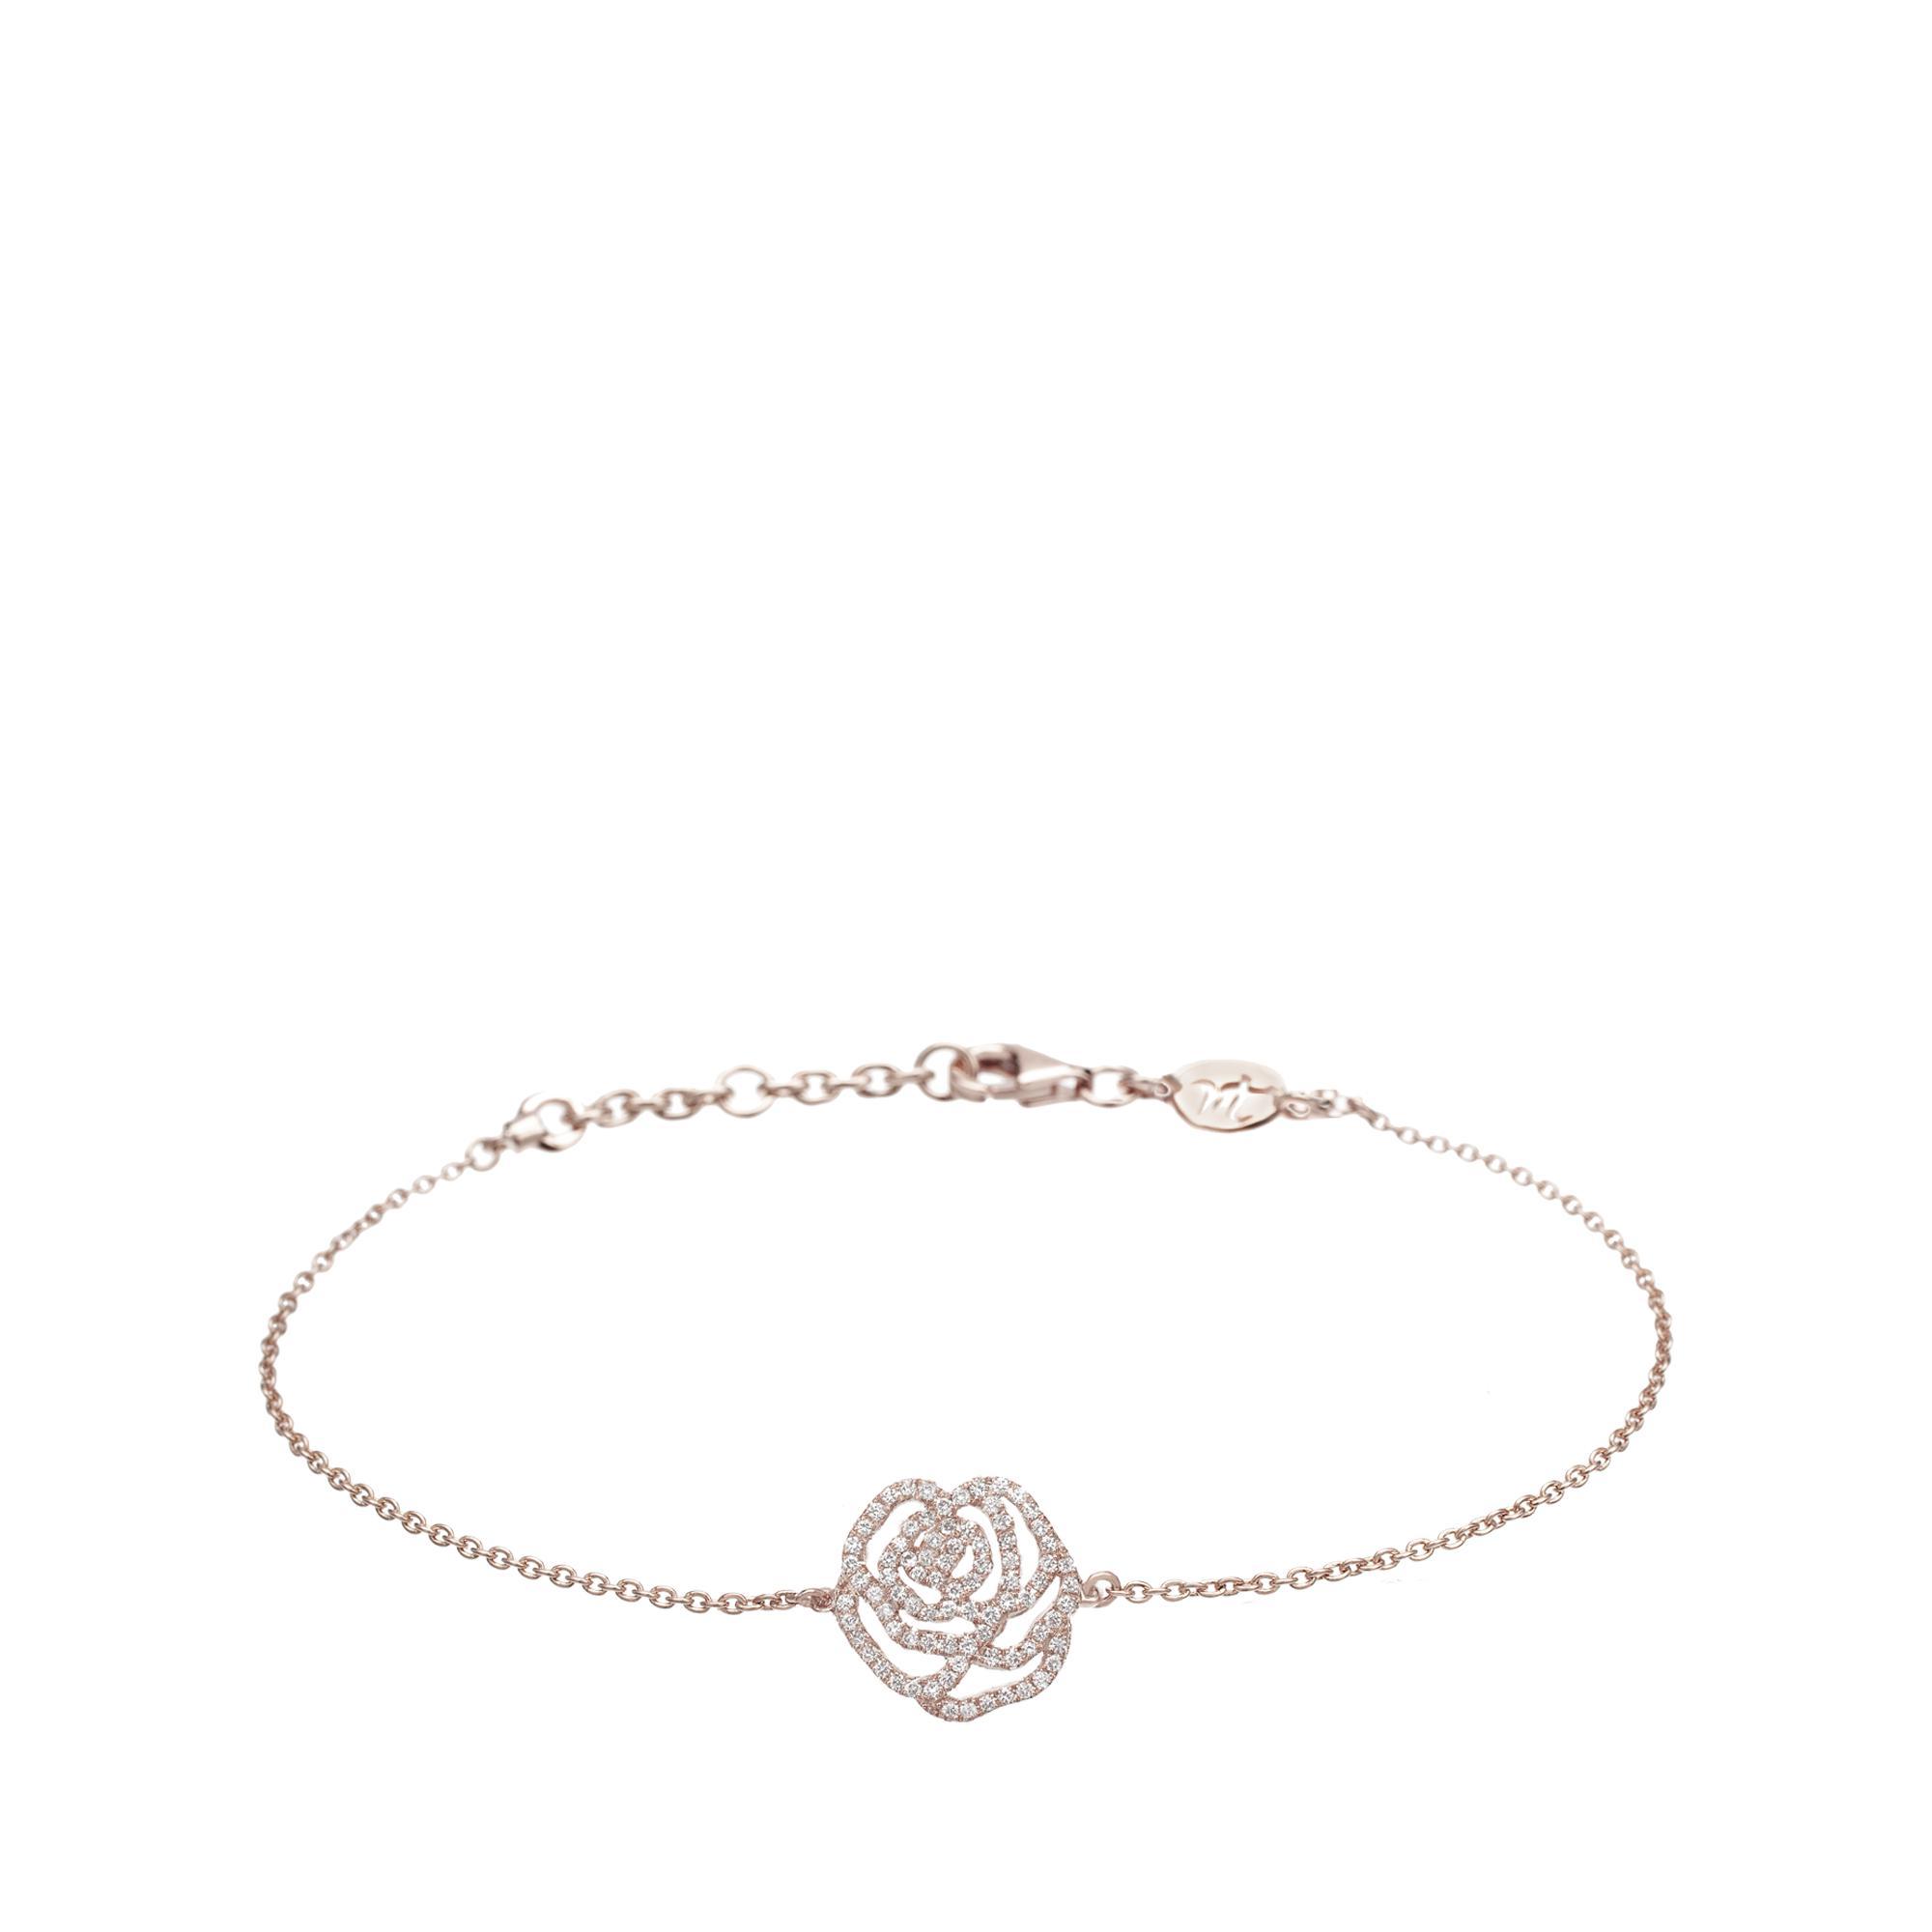 Vanessa Tugendhaft Yellow Gold and Diamond Round Charm Bracelet HgLcJyeU